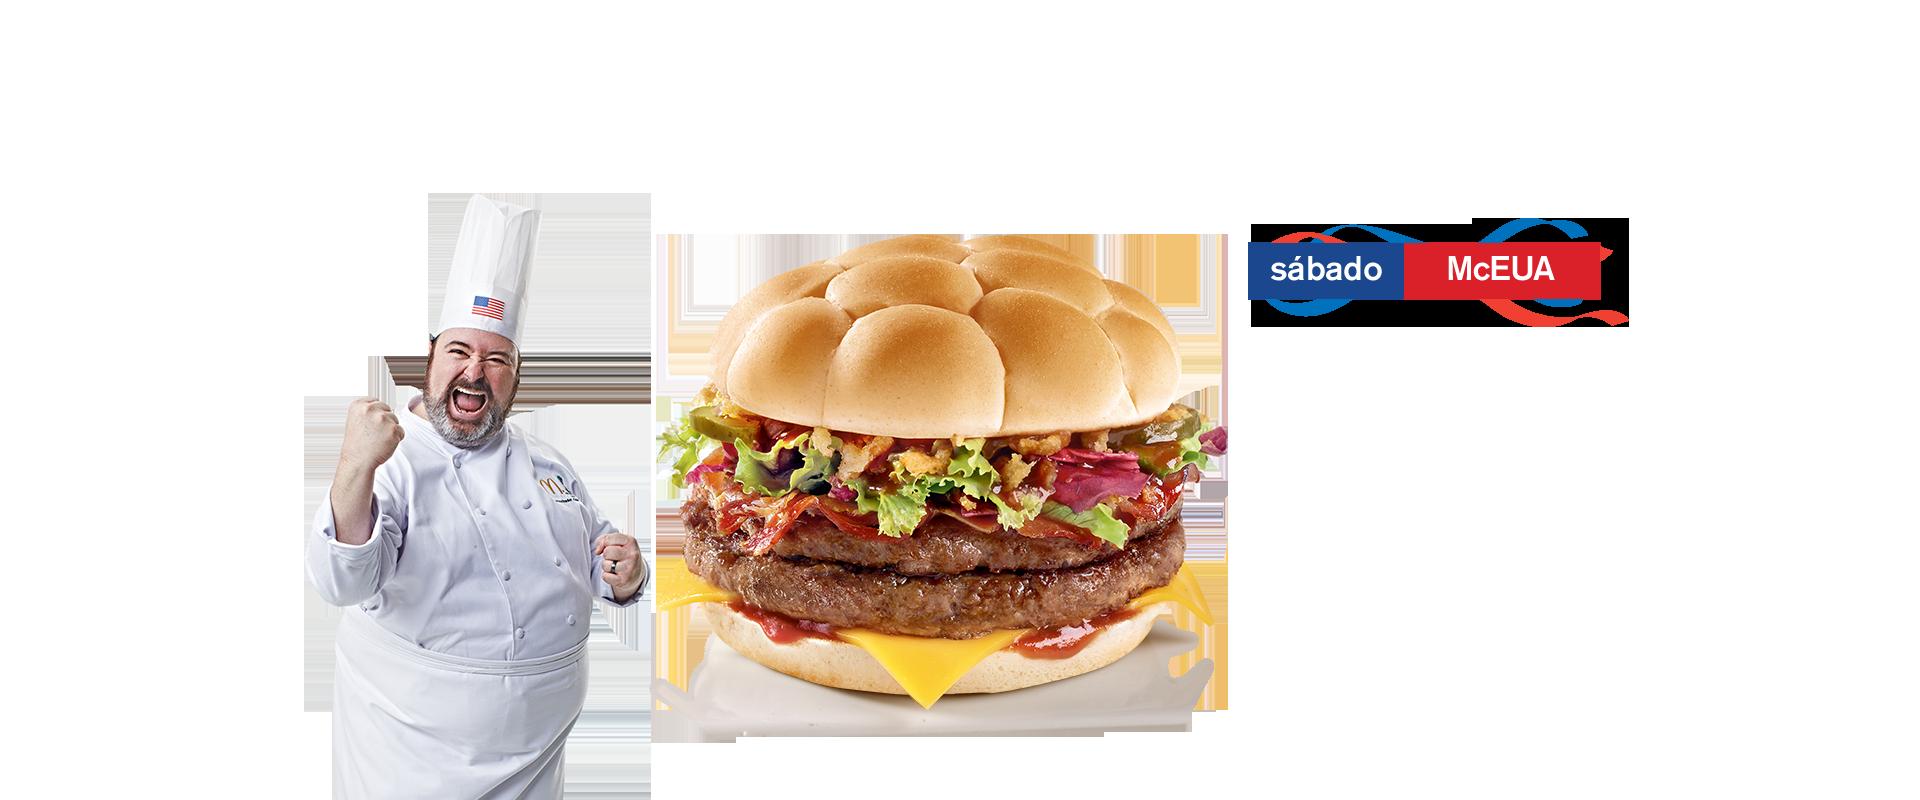 Burger McEUA  McDonald's - Coupe du Monde 2014 (USA)